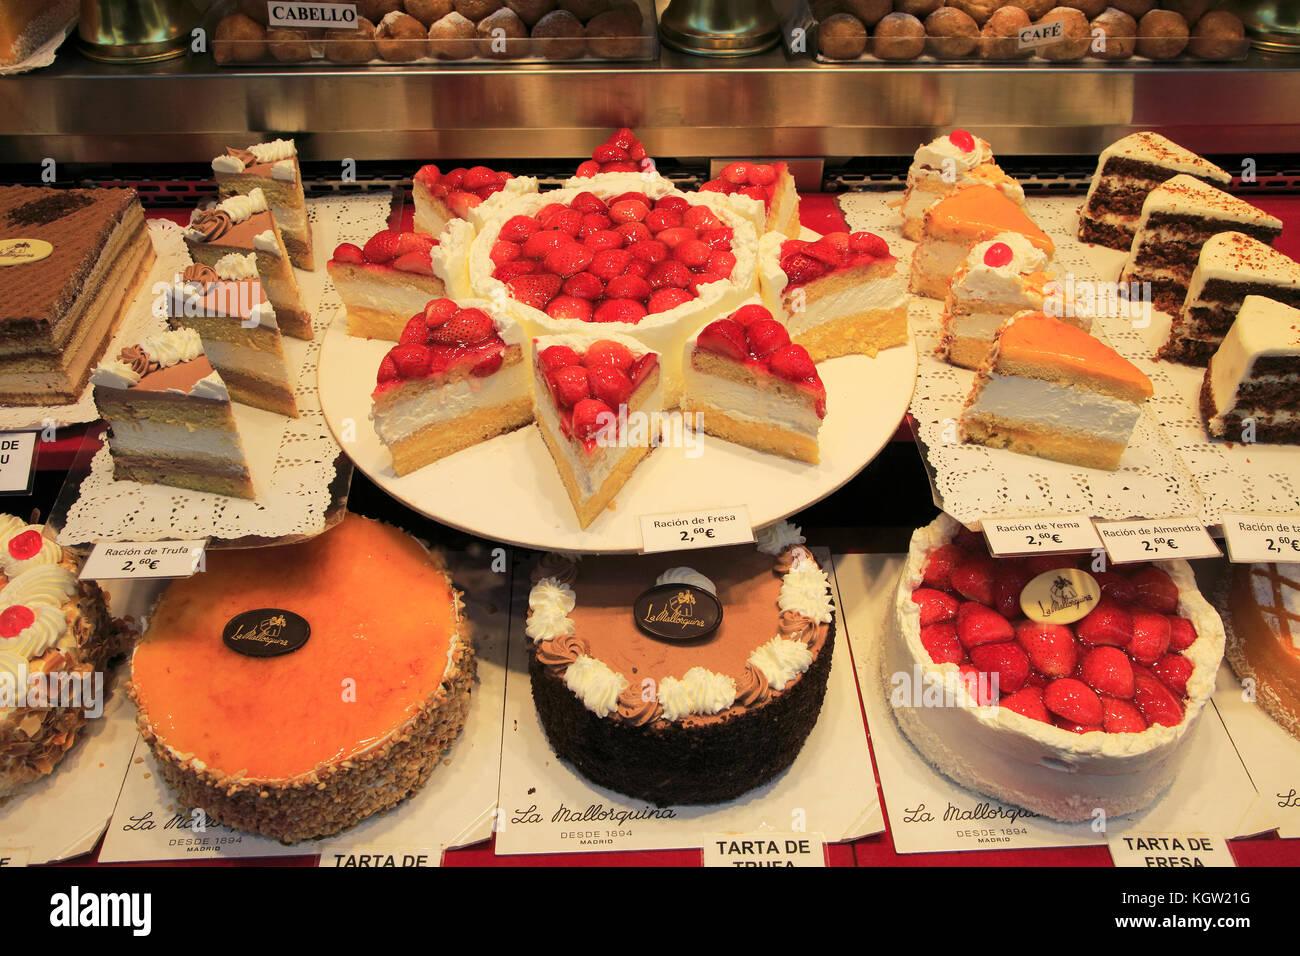 Cakes window display baker confectionery shop, La Mallorquina, Calle Mayor, Madrid, Spain - Stock Image